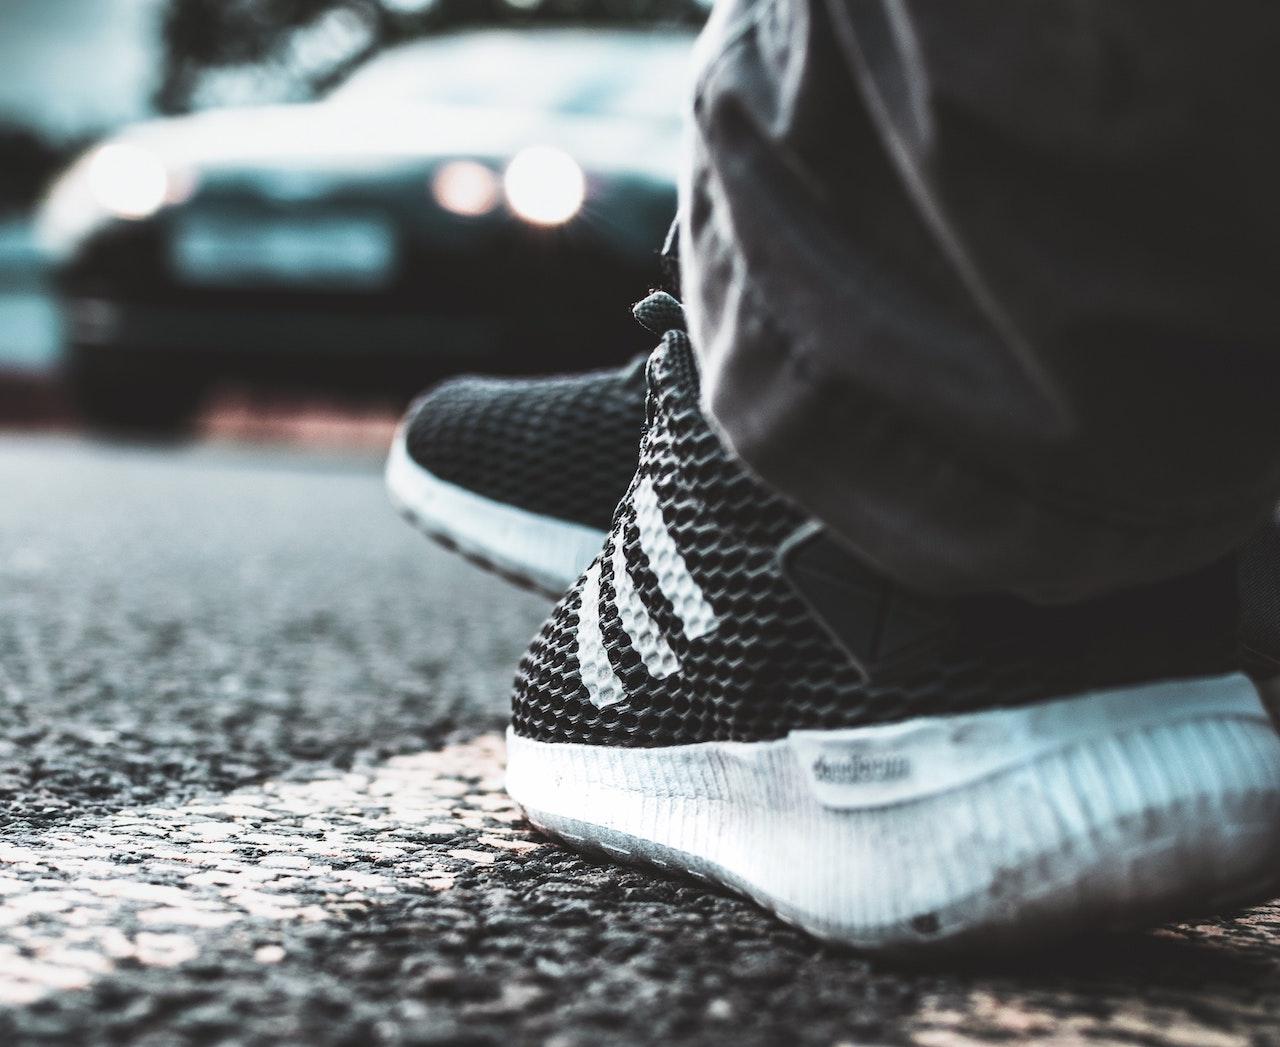 Roadside shoes, car passing